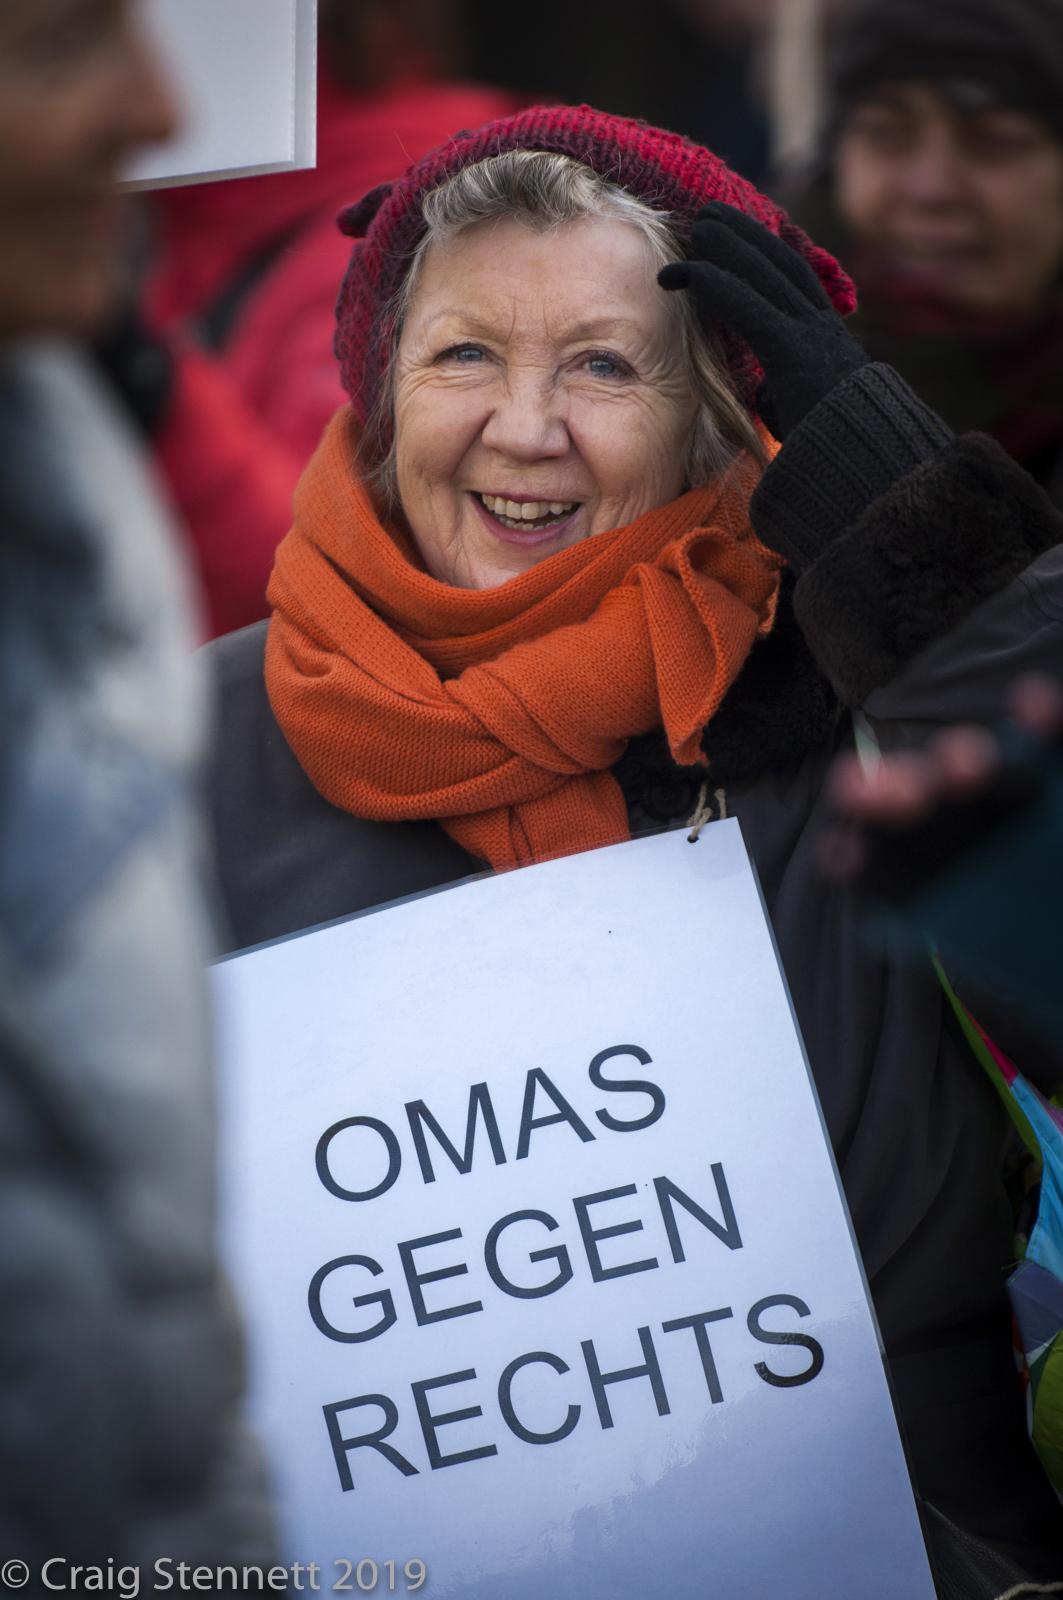 Marion Geisler Omas Gegen Rechts, (Grannies against the Right) Berlin, Germany.